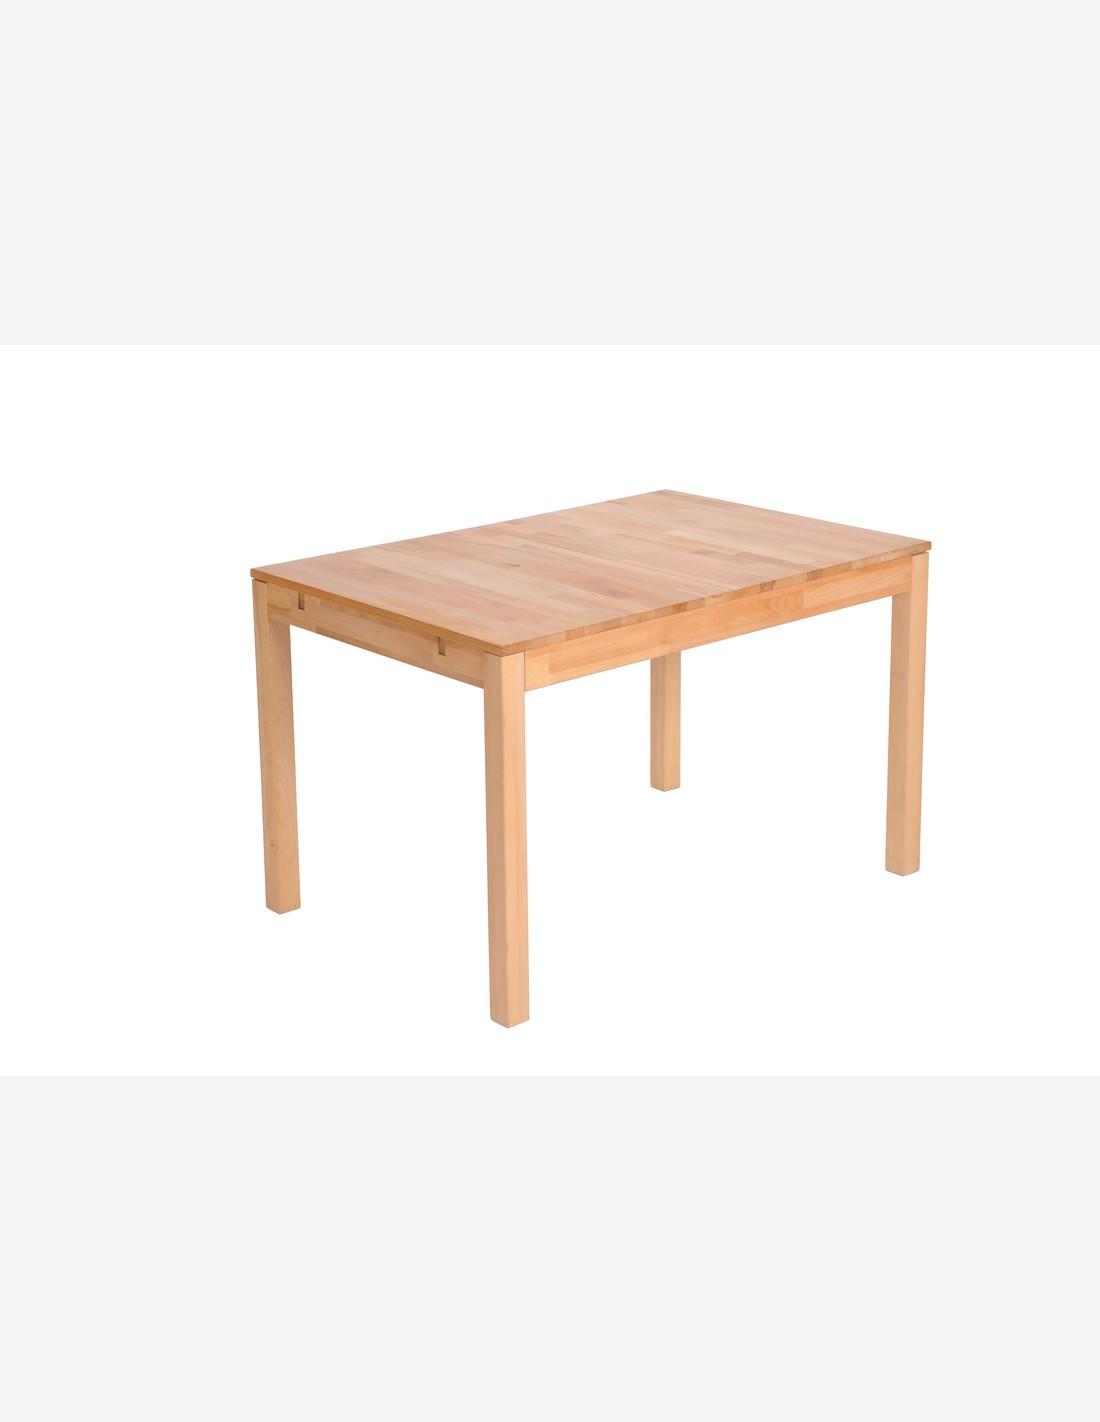 Alf avantishop - Misure tavolo da cucina ...